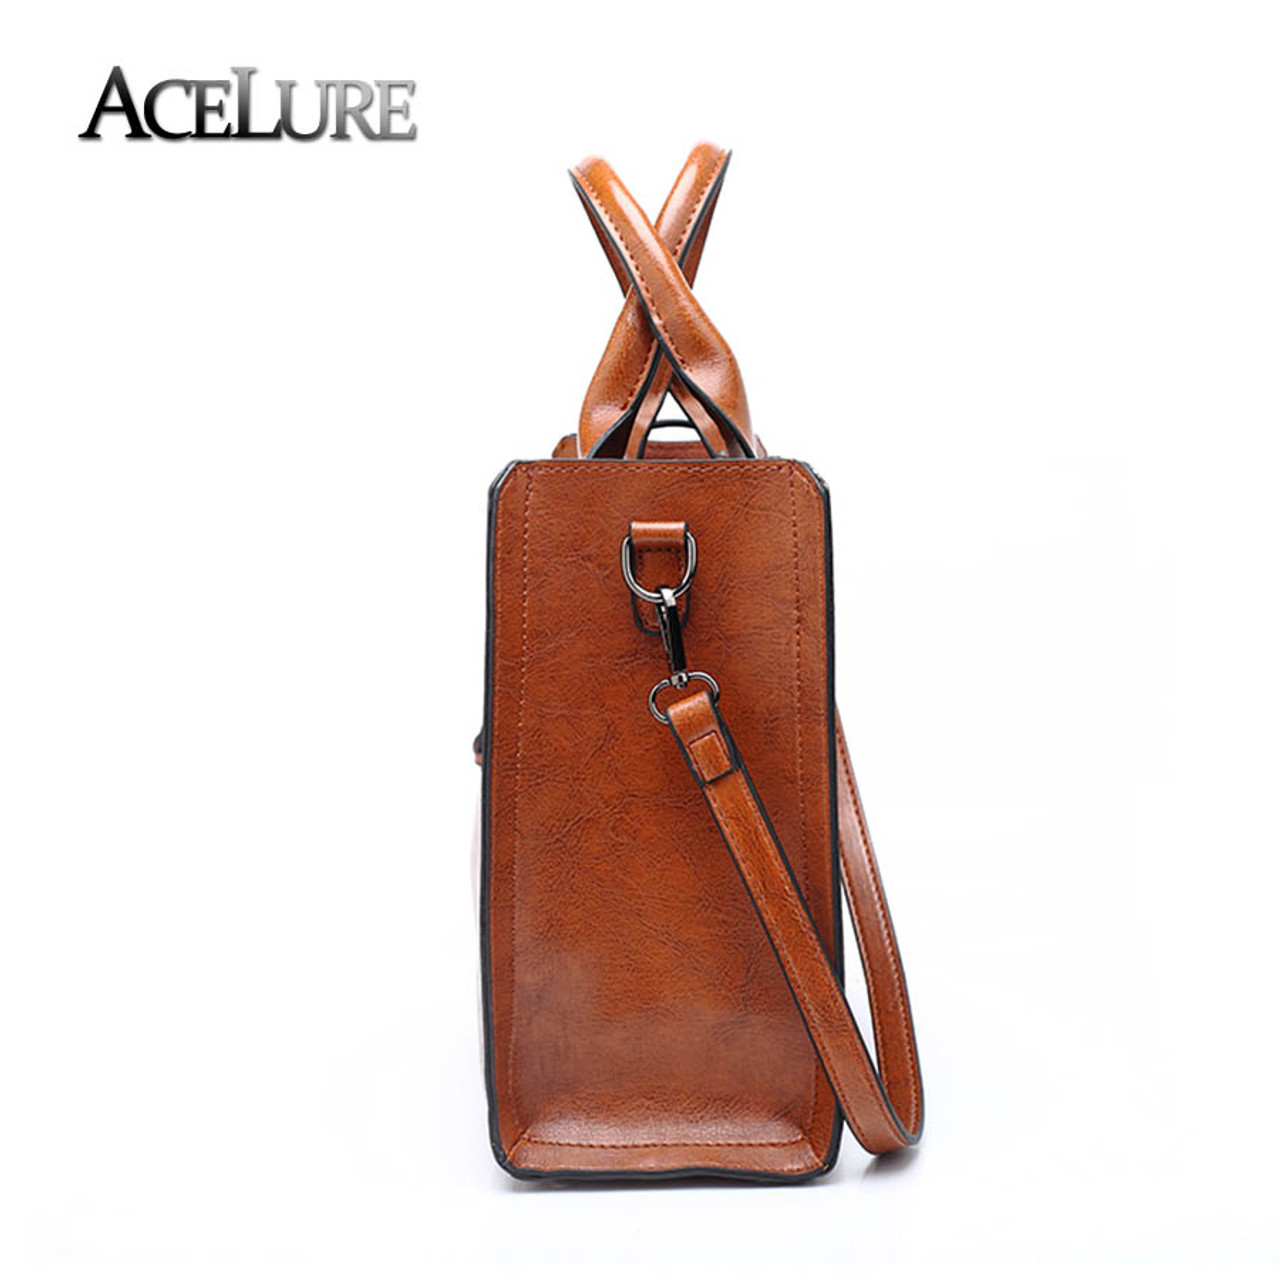 3c10122bc0cd ... Casual Female Bags Trunk Tote Spanish Brand Shoulder · ACELURE Leather  Handbags Big Women Bag High Quality · ACELURE Leather Handbags Big Women  Bag High ...